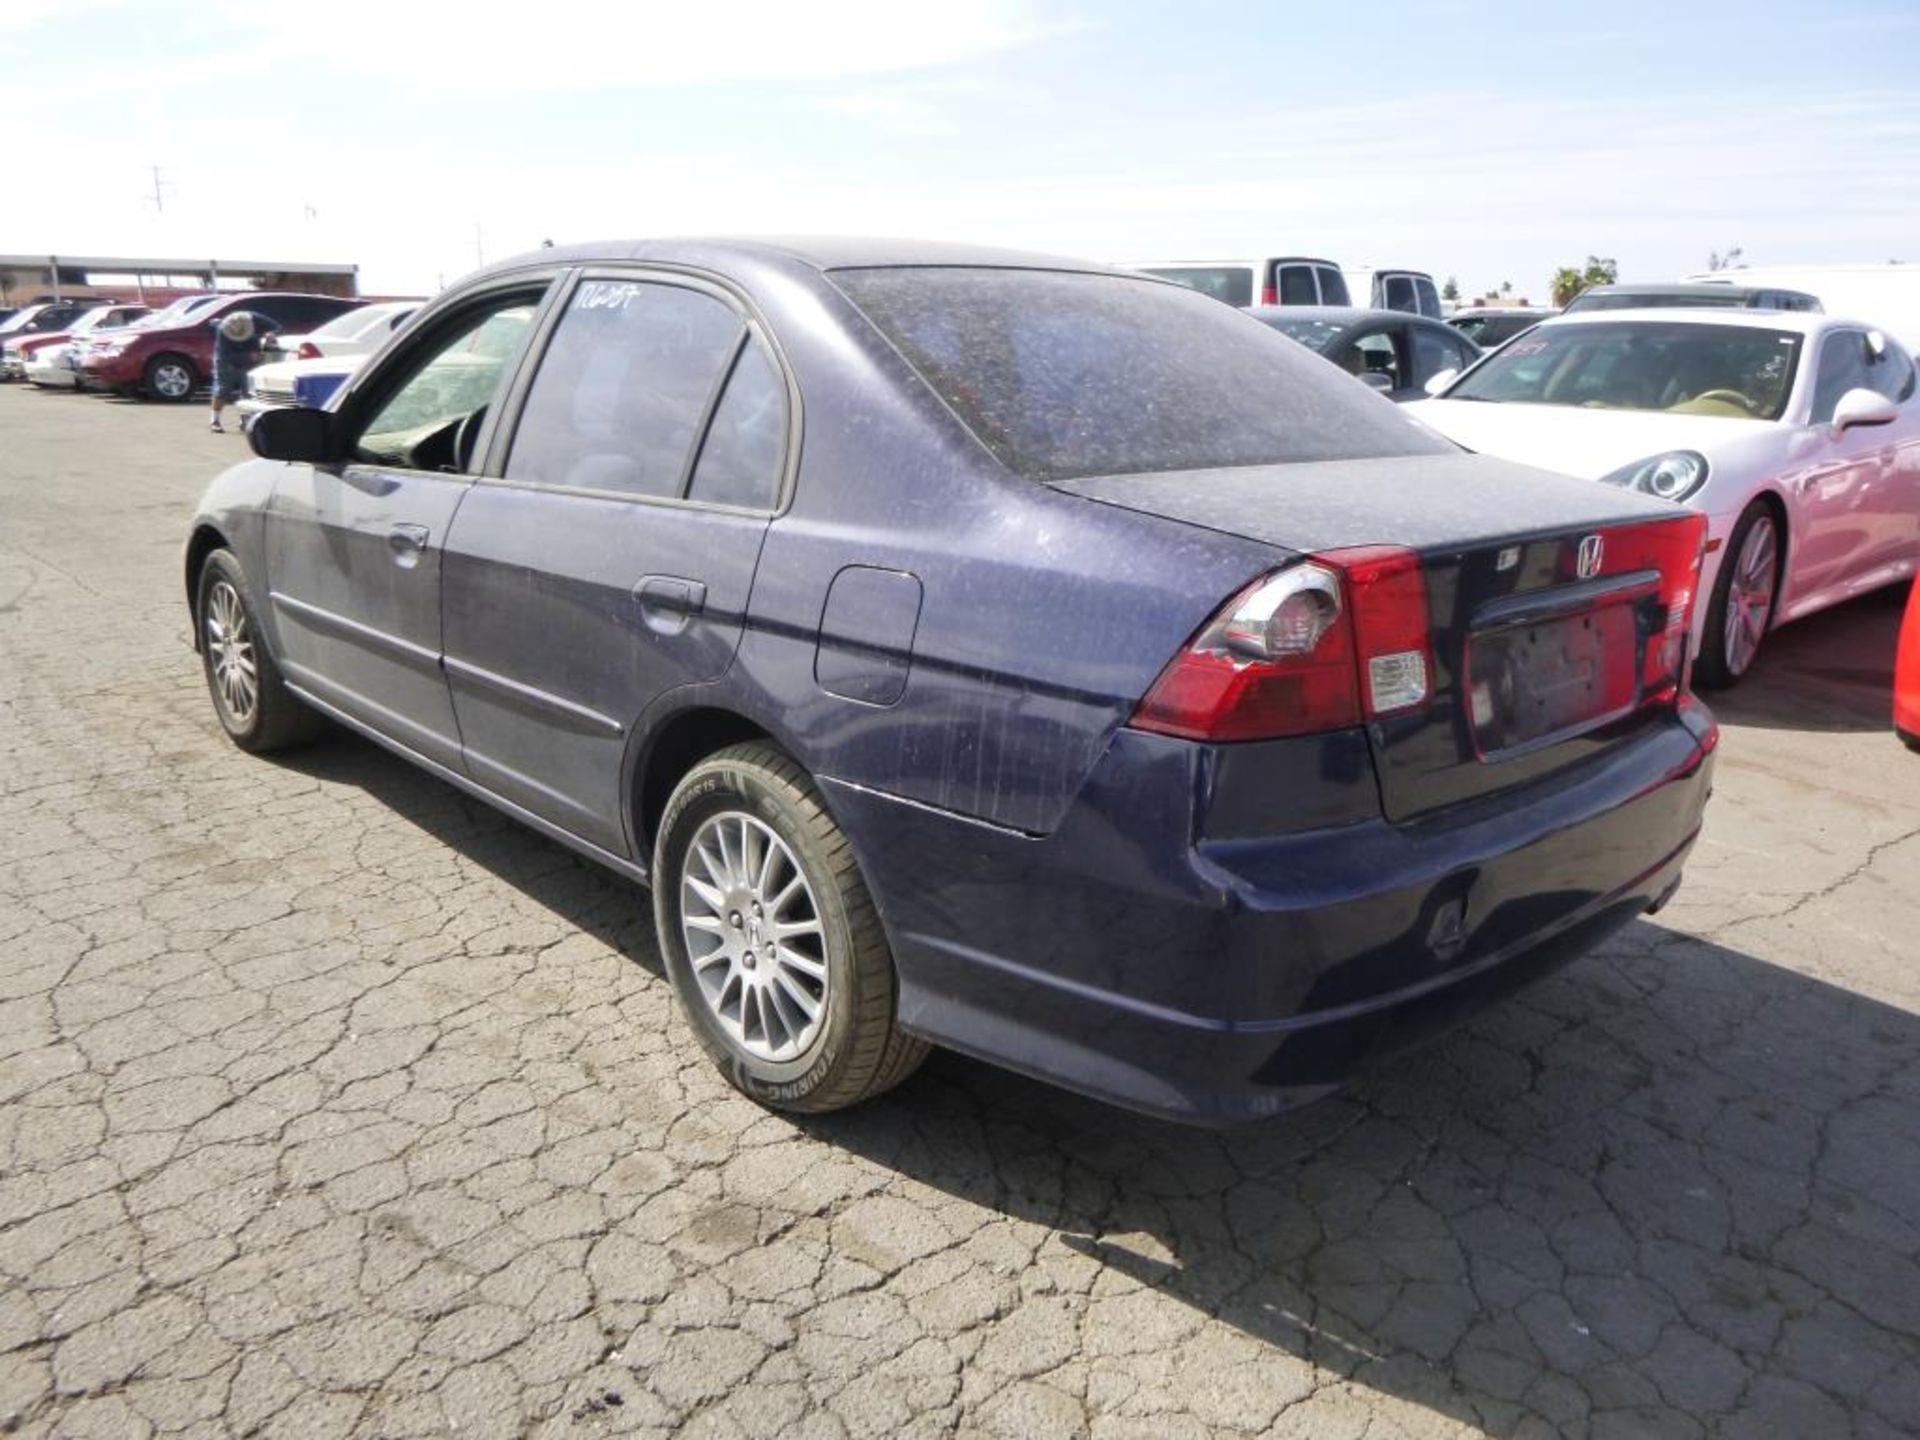 2004 Honda Civic - Image 2 of 14